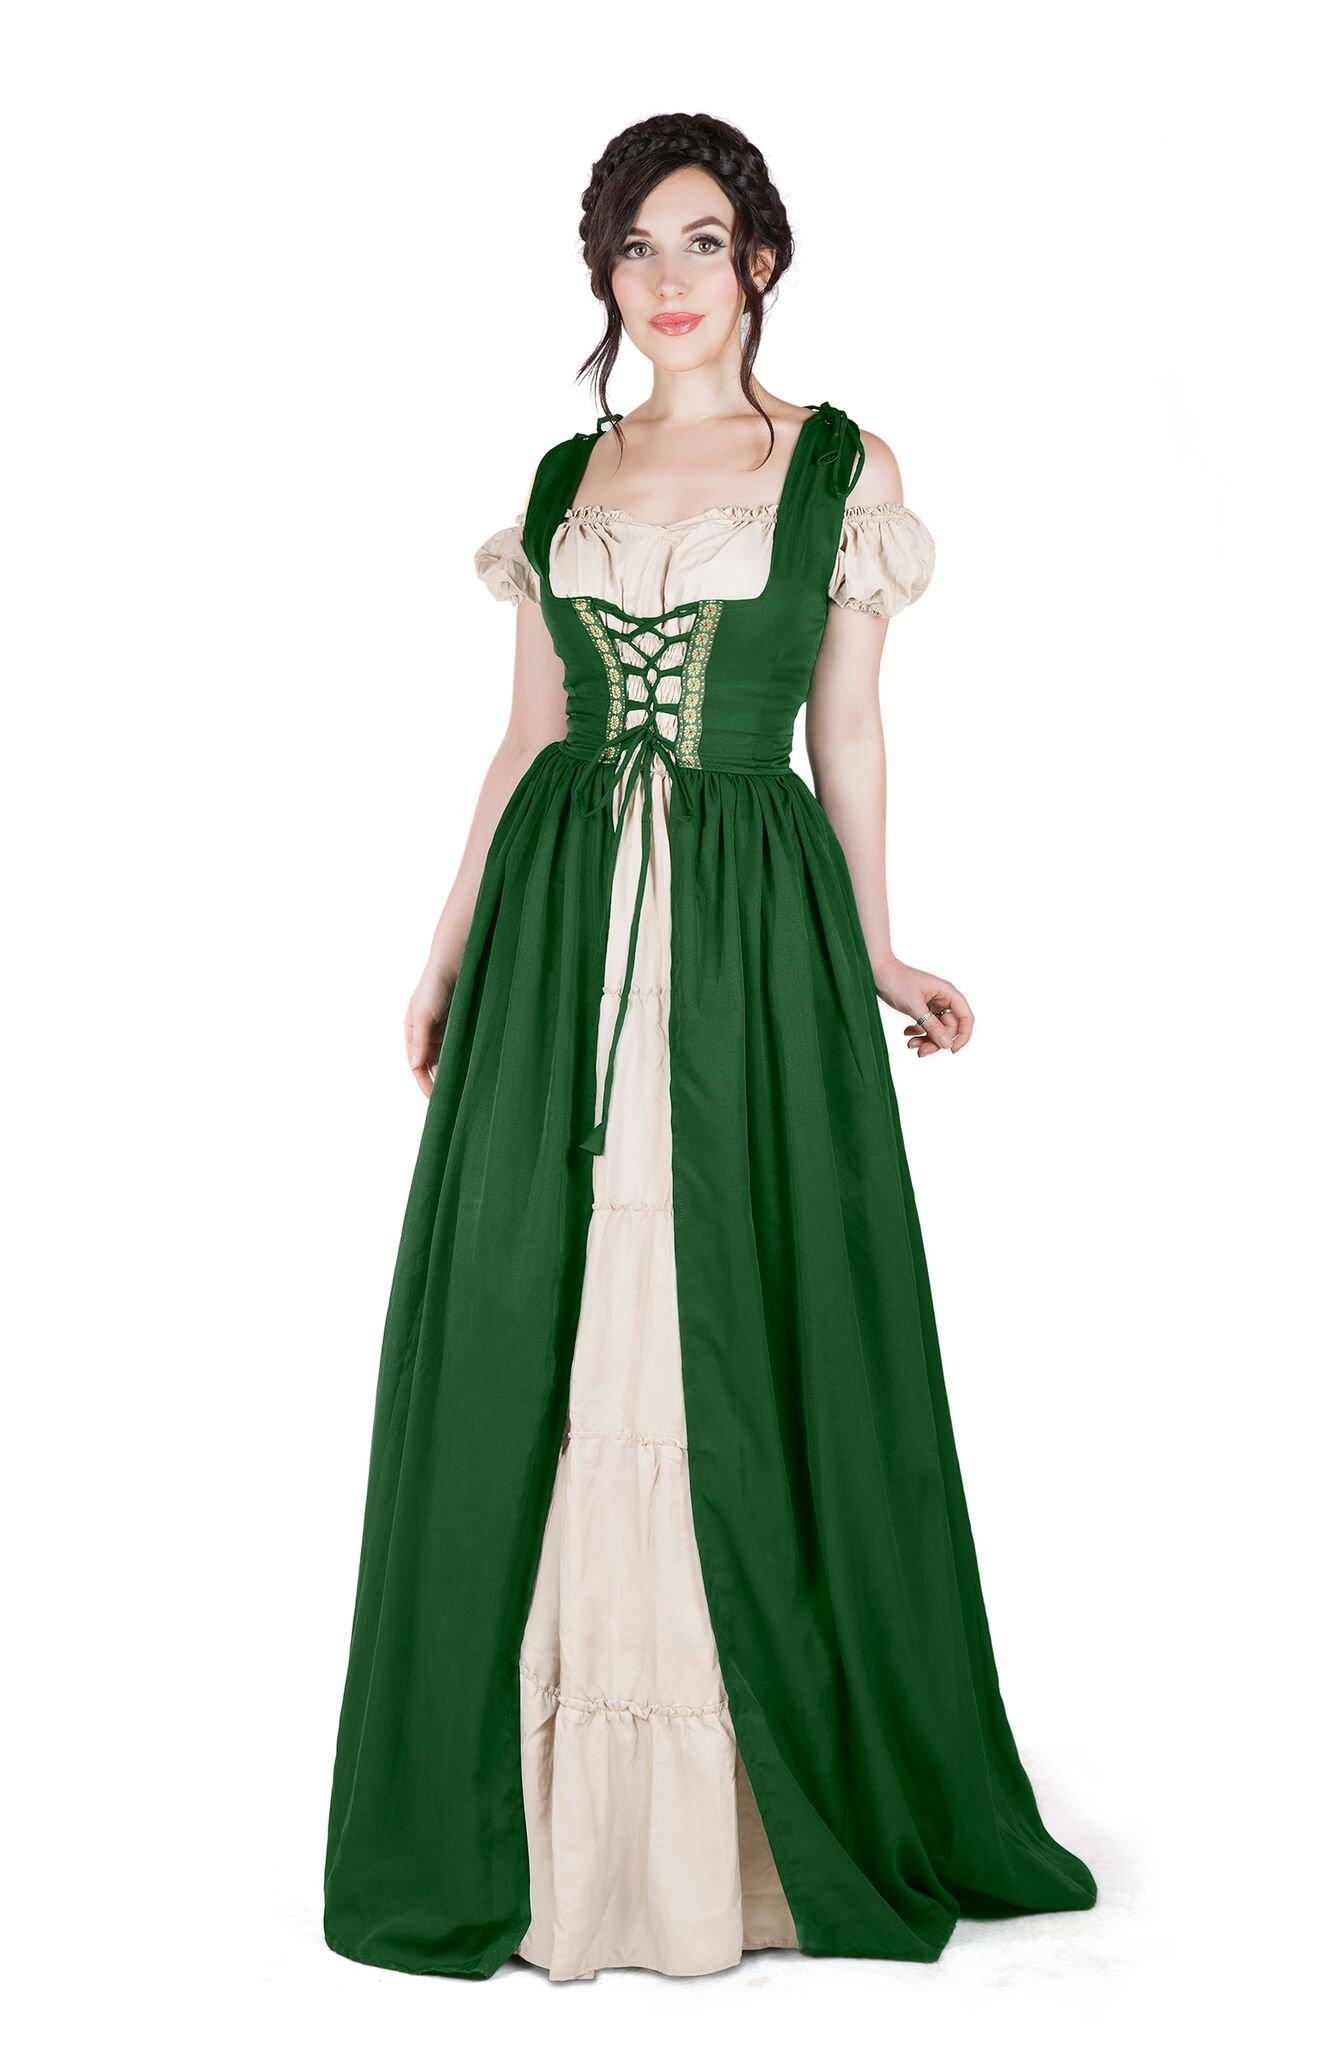 I Do Declare Renaissance Medieval Irish Costume Over Dress & Boho Chemise Set (S/M, Hunter Green)